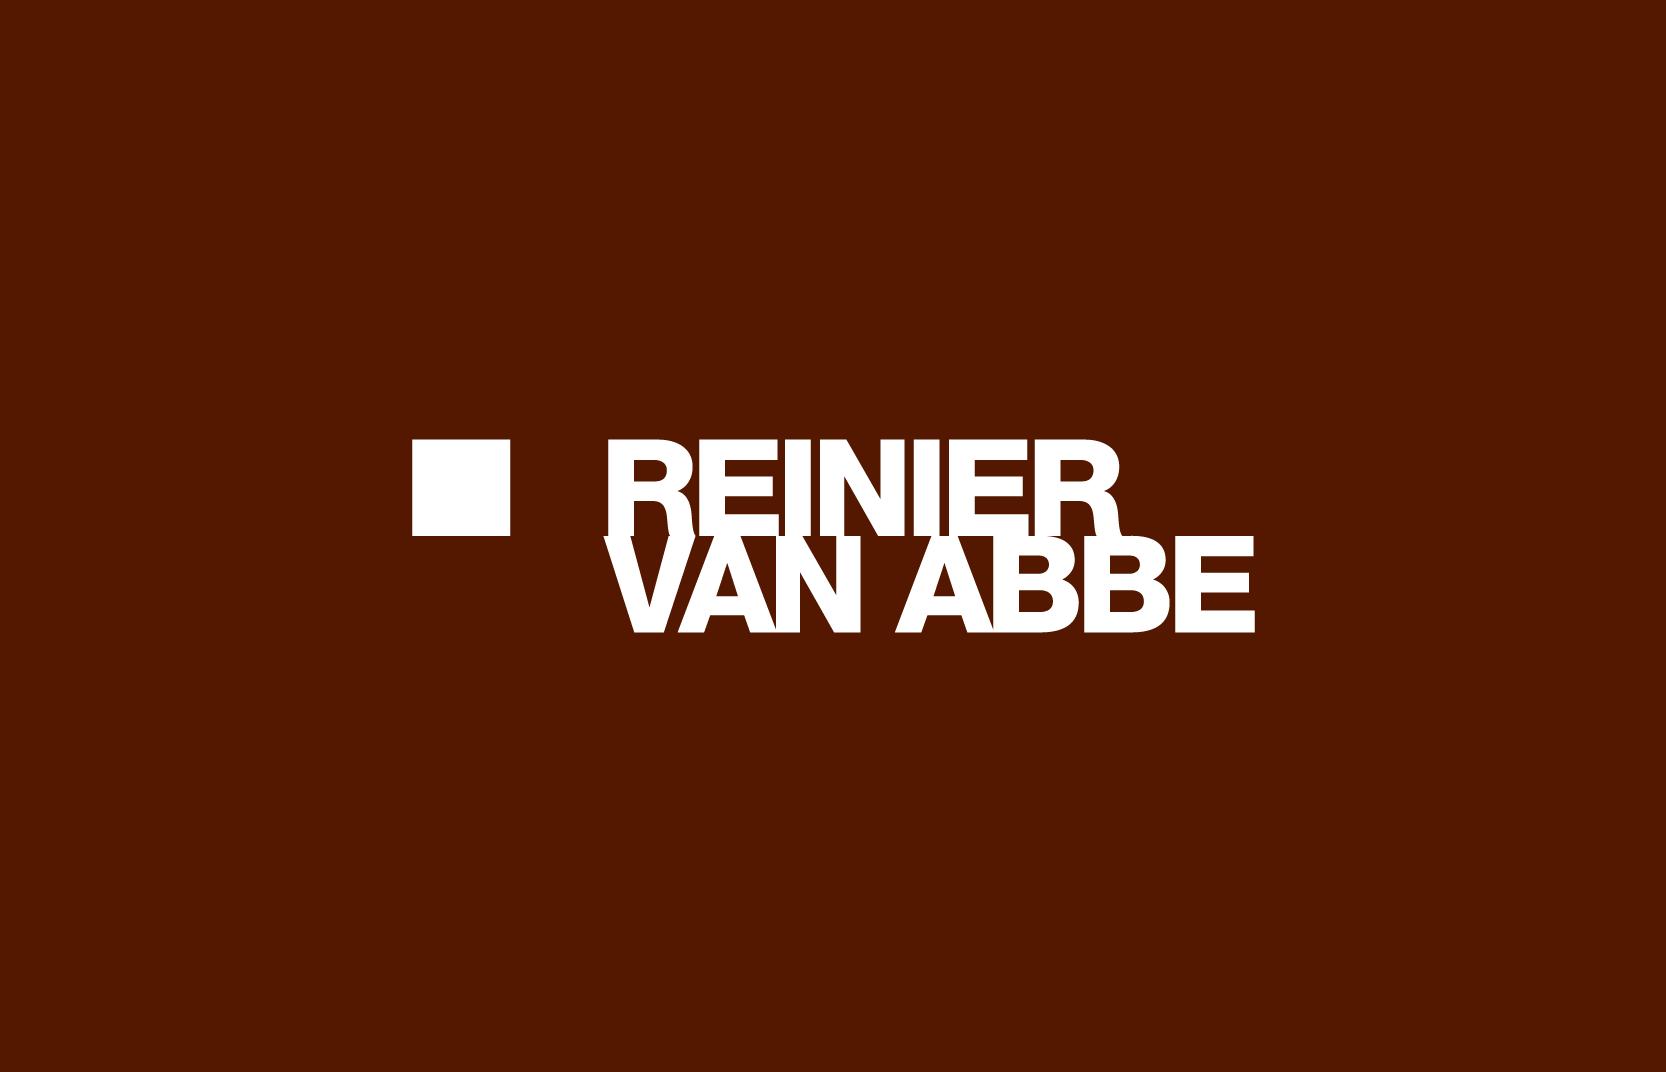 multi_reiniervanabbe_logo0